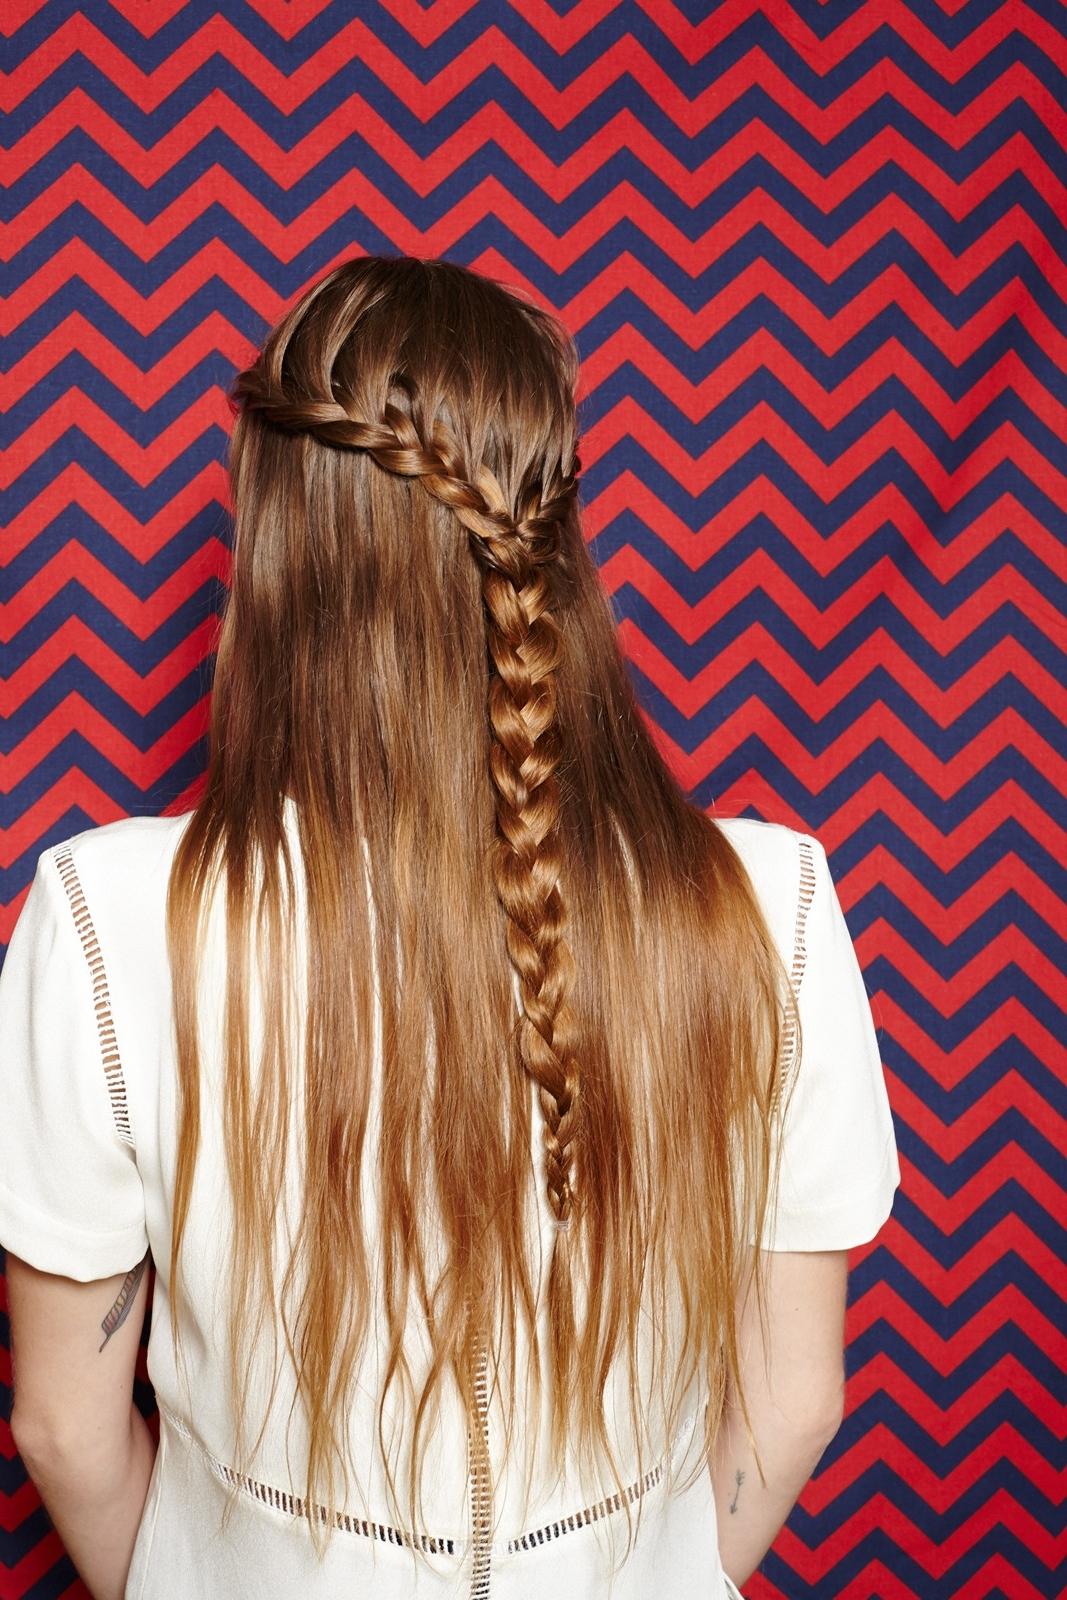 Classic Braided Hairstyles – Braid Tutorials Throughout Favorite Two Classic Braids Hairstyles (View 14 of 15)